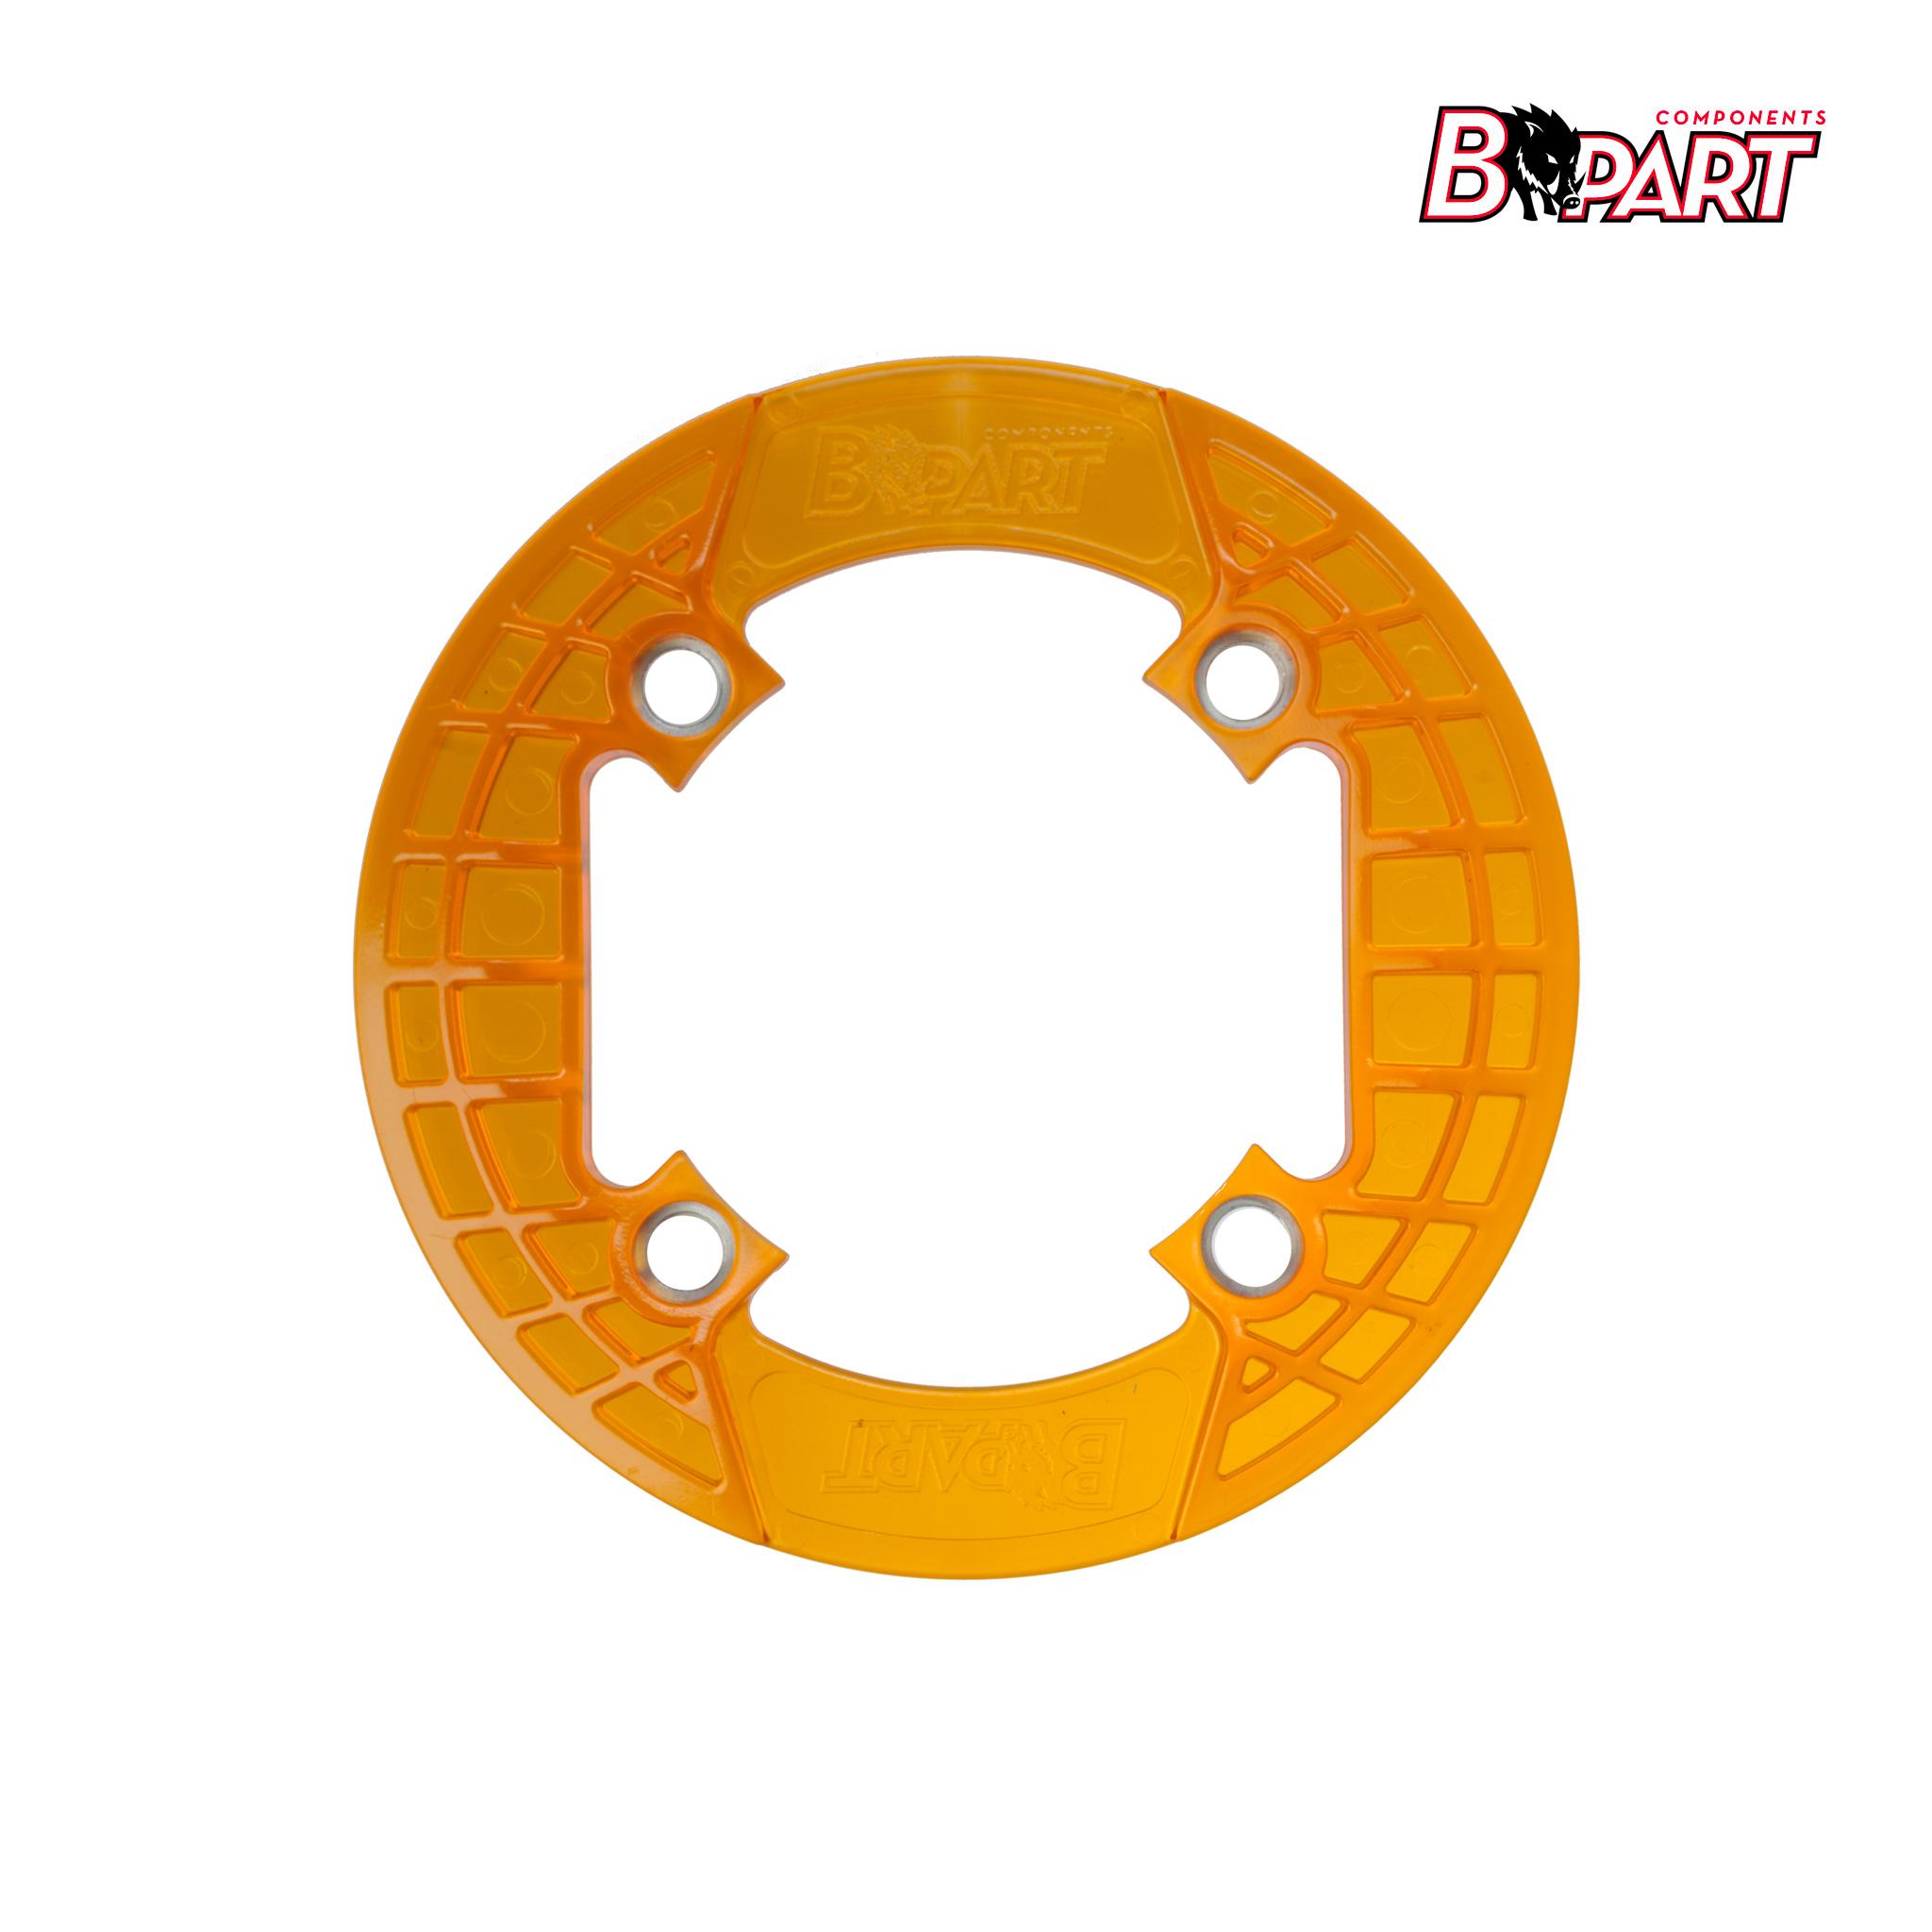 Bpart Components cubreplatos naranja traslucido